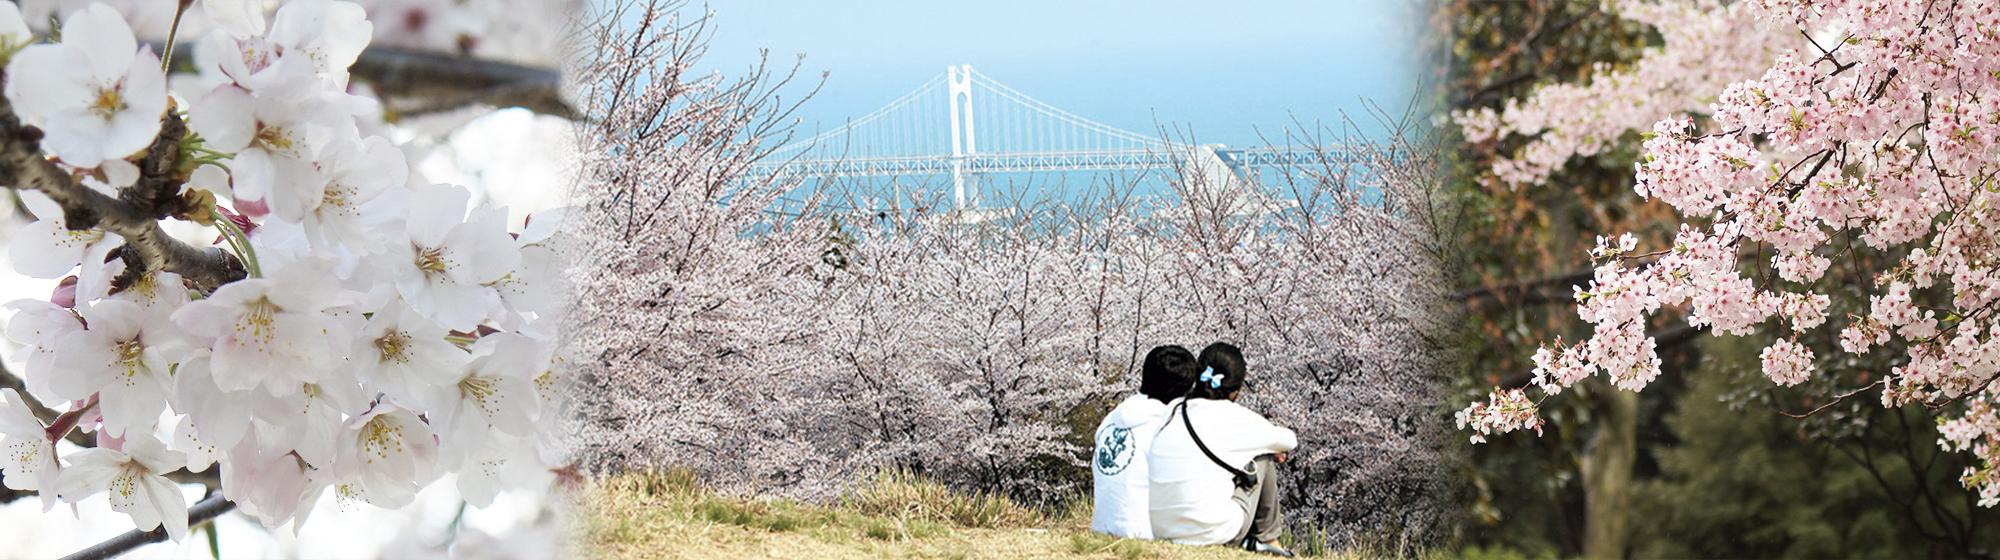 2020 Busan Cherry Blossom 1Day Shuttle Bus Tour – From Busan (Mar 27 – April 12) | KoreaTravelEasy